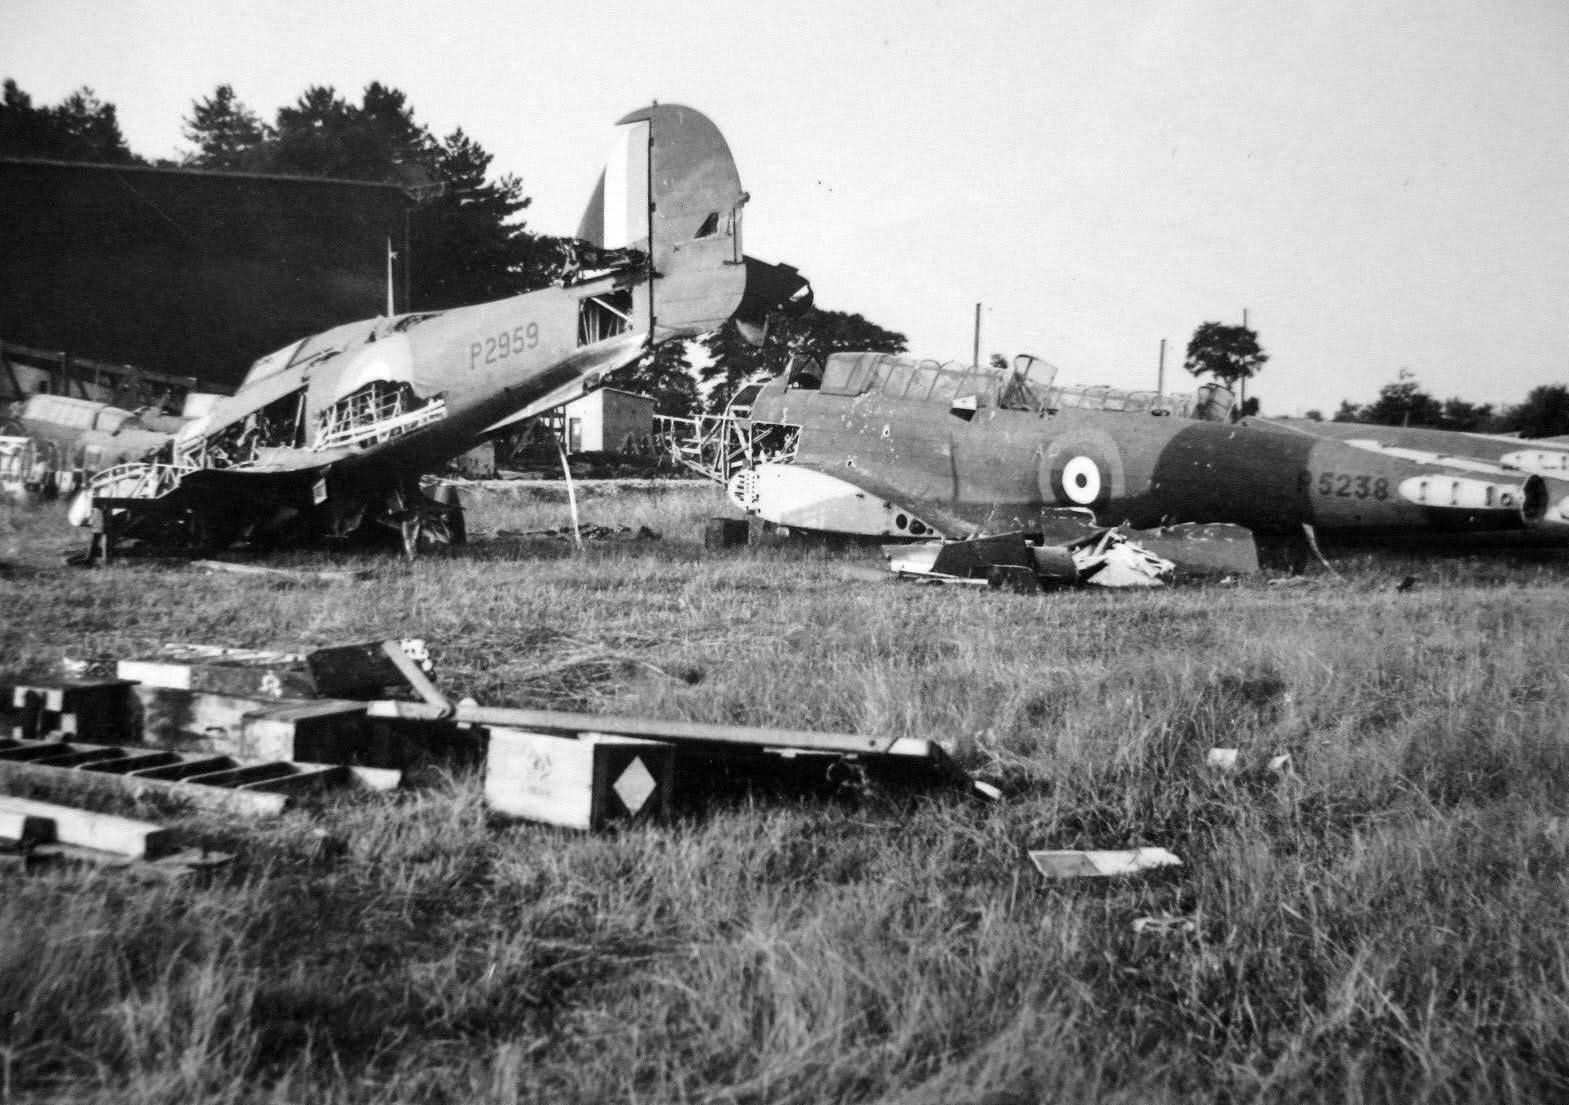 Hawker Hurricane P2959 and Fairey Battle P5238 Épernay Plivot Airfield